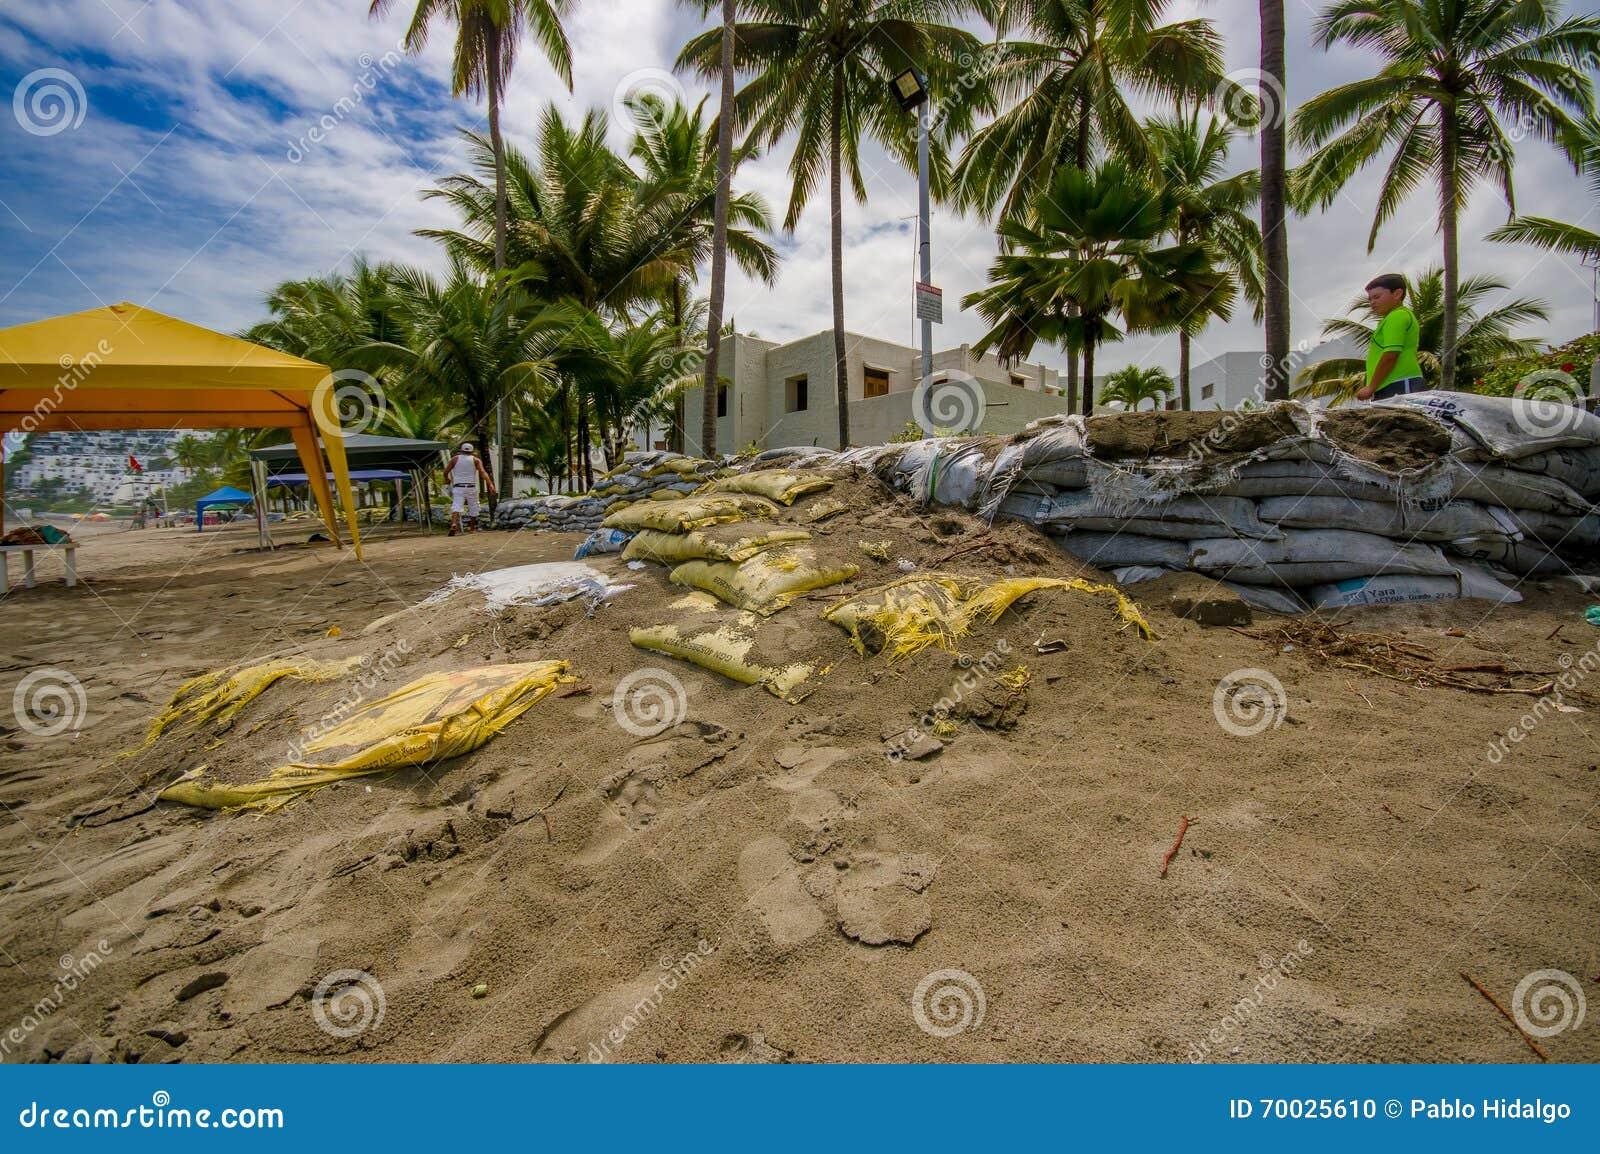 Esmeraldas equateur 16 mars 2016 sacs de sable prot ger contre l 39 i - Sac de sable inondation ...